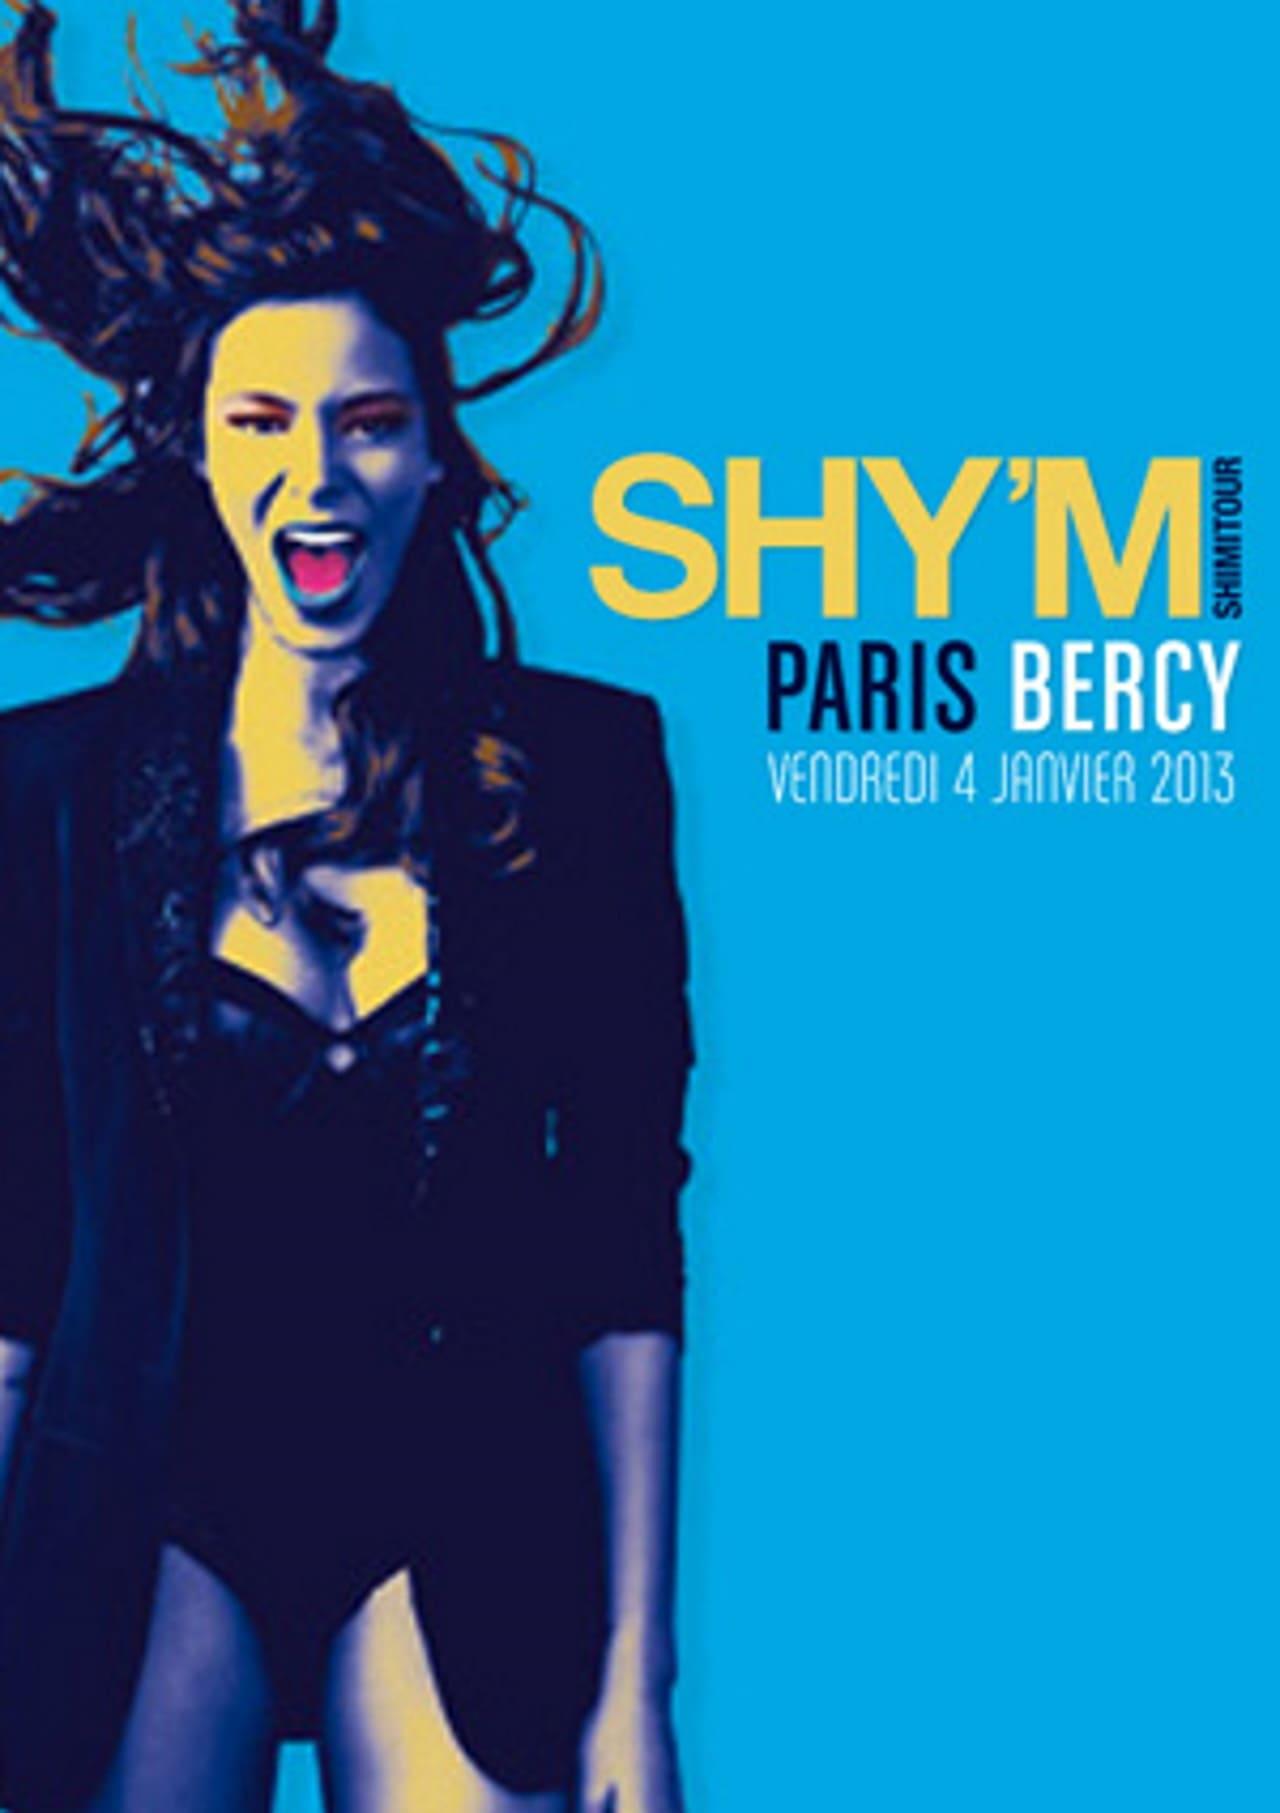 Shy'm - Shimitour Paris Bercy